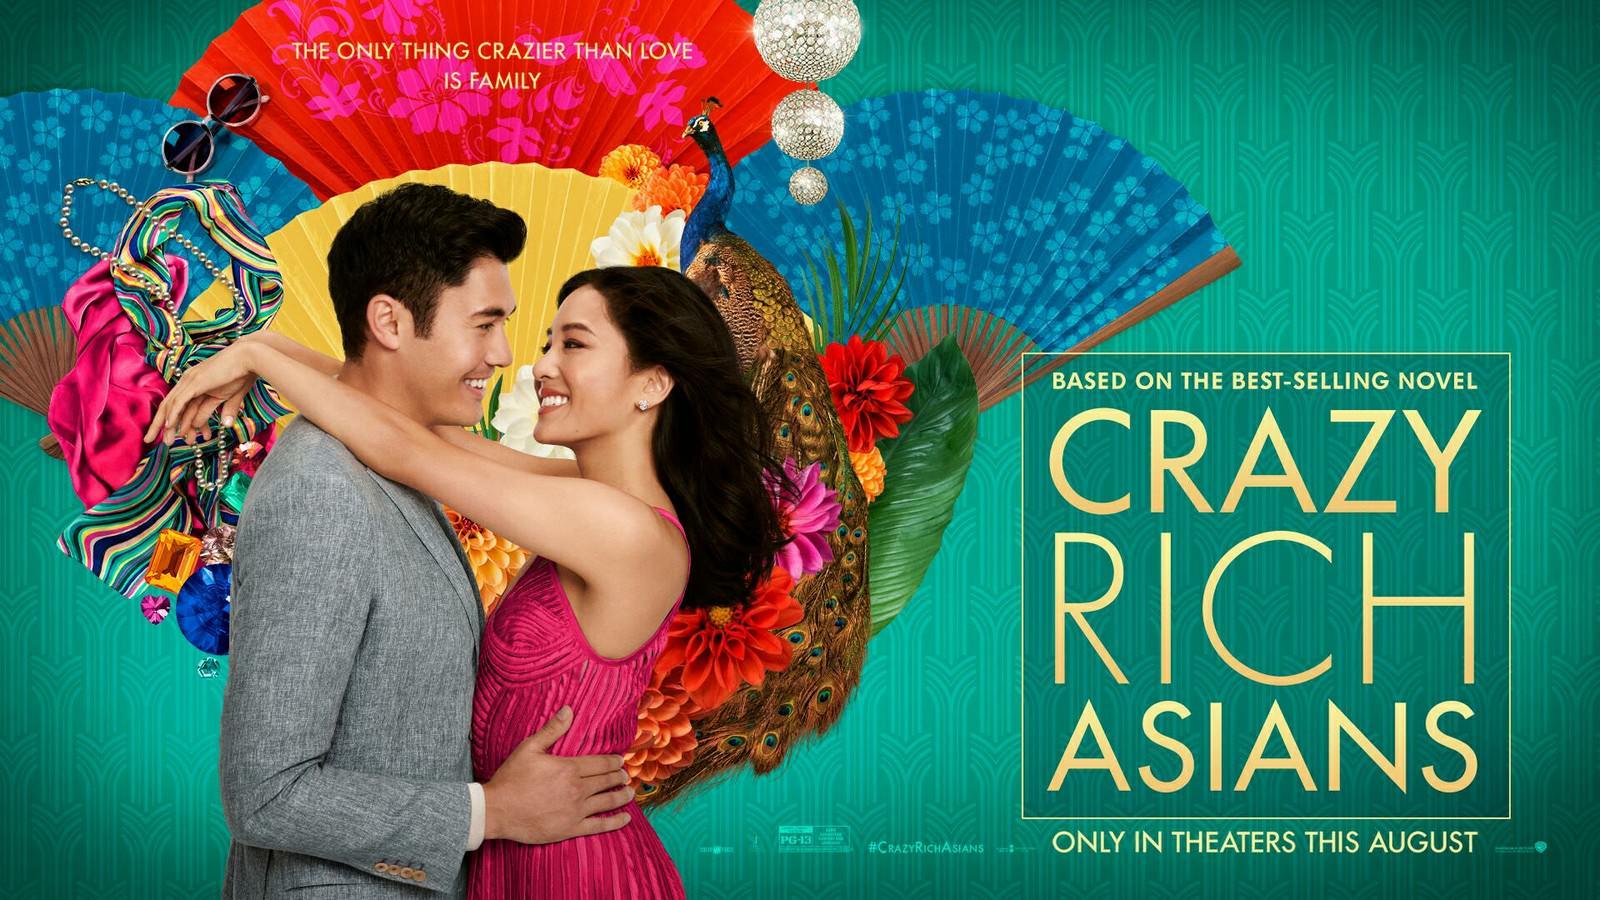 Movie, Crazy Rich Asians(美國, 2018) / 瘋狂亞洲富豪(台) / 我的超豪男友(港) / 摘金奇缘(網), 電影海報, 美國, 橫版